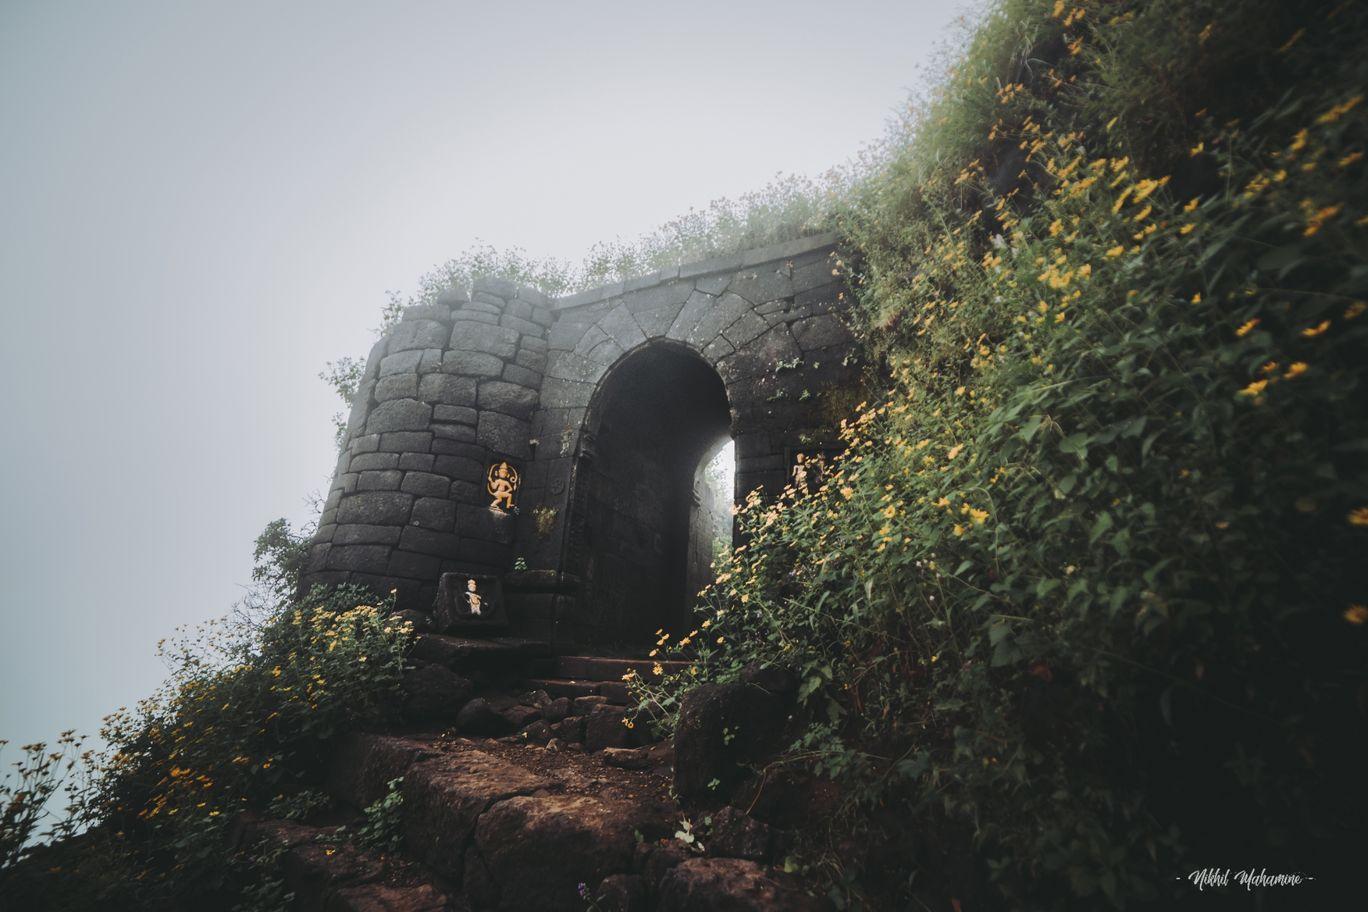 Photo of Ratangad Fort By Nikhil Mahamine